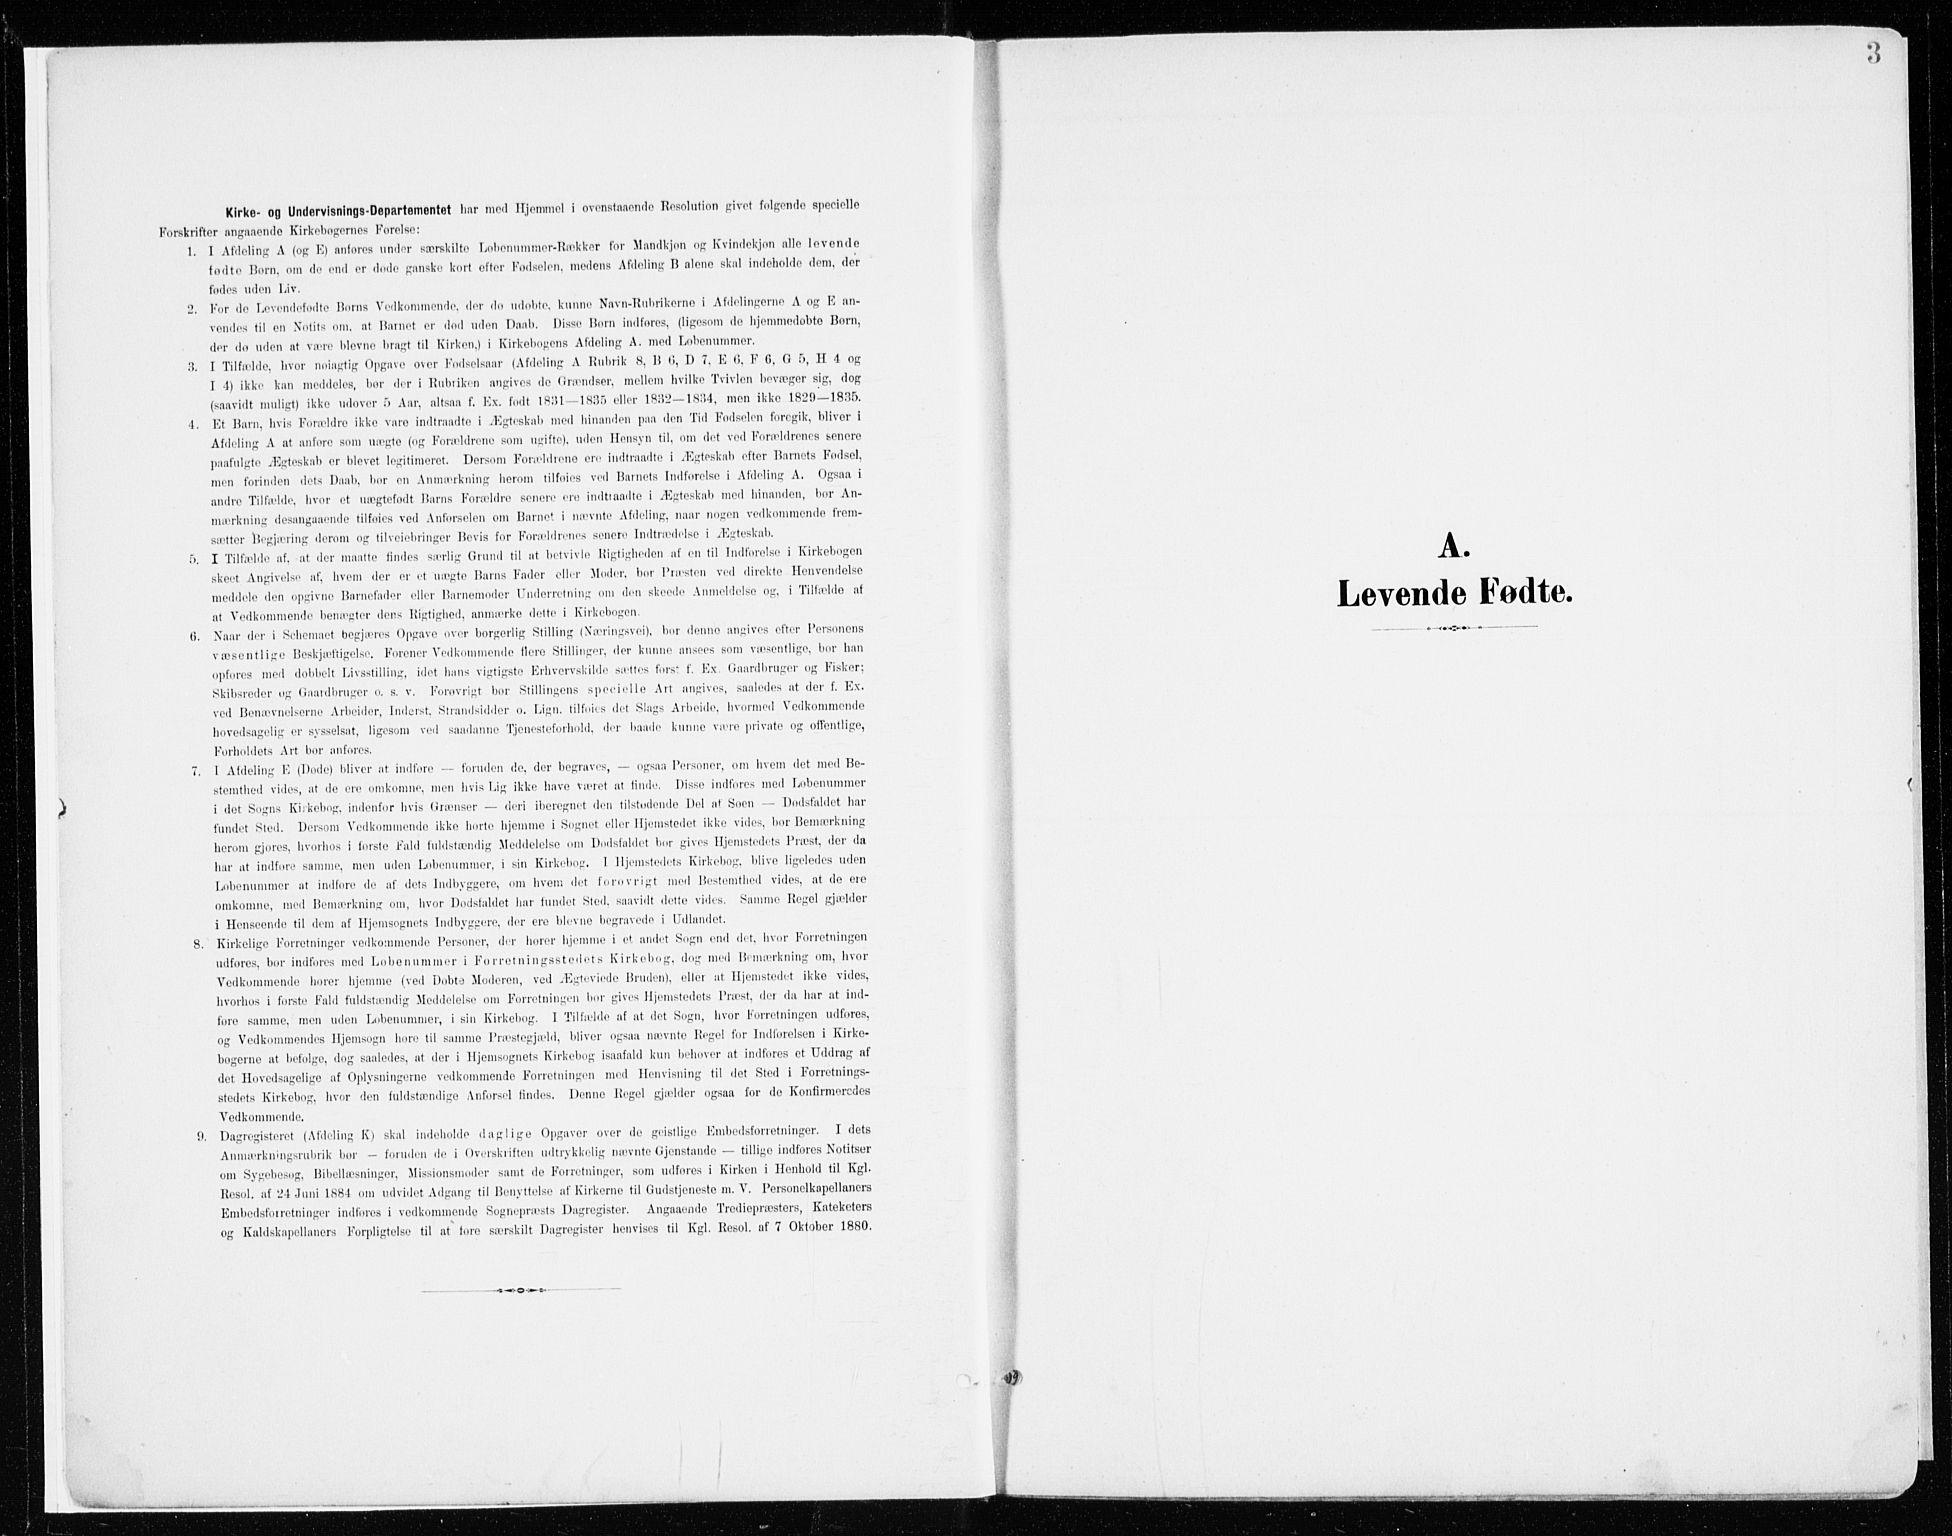 SAH, Nord-Odal prestekontor, Ministerialbok nr. 9, 1902-1926, s. 3